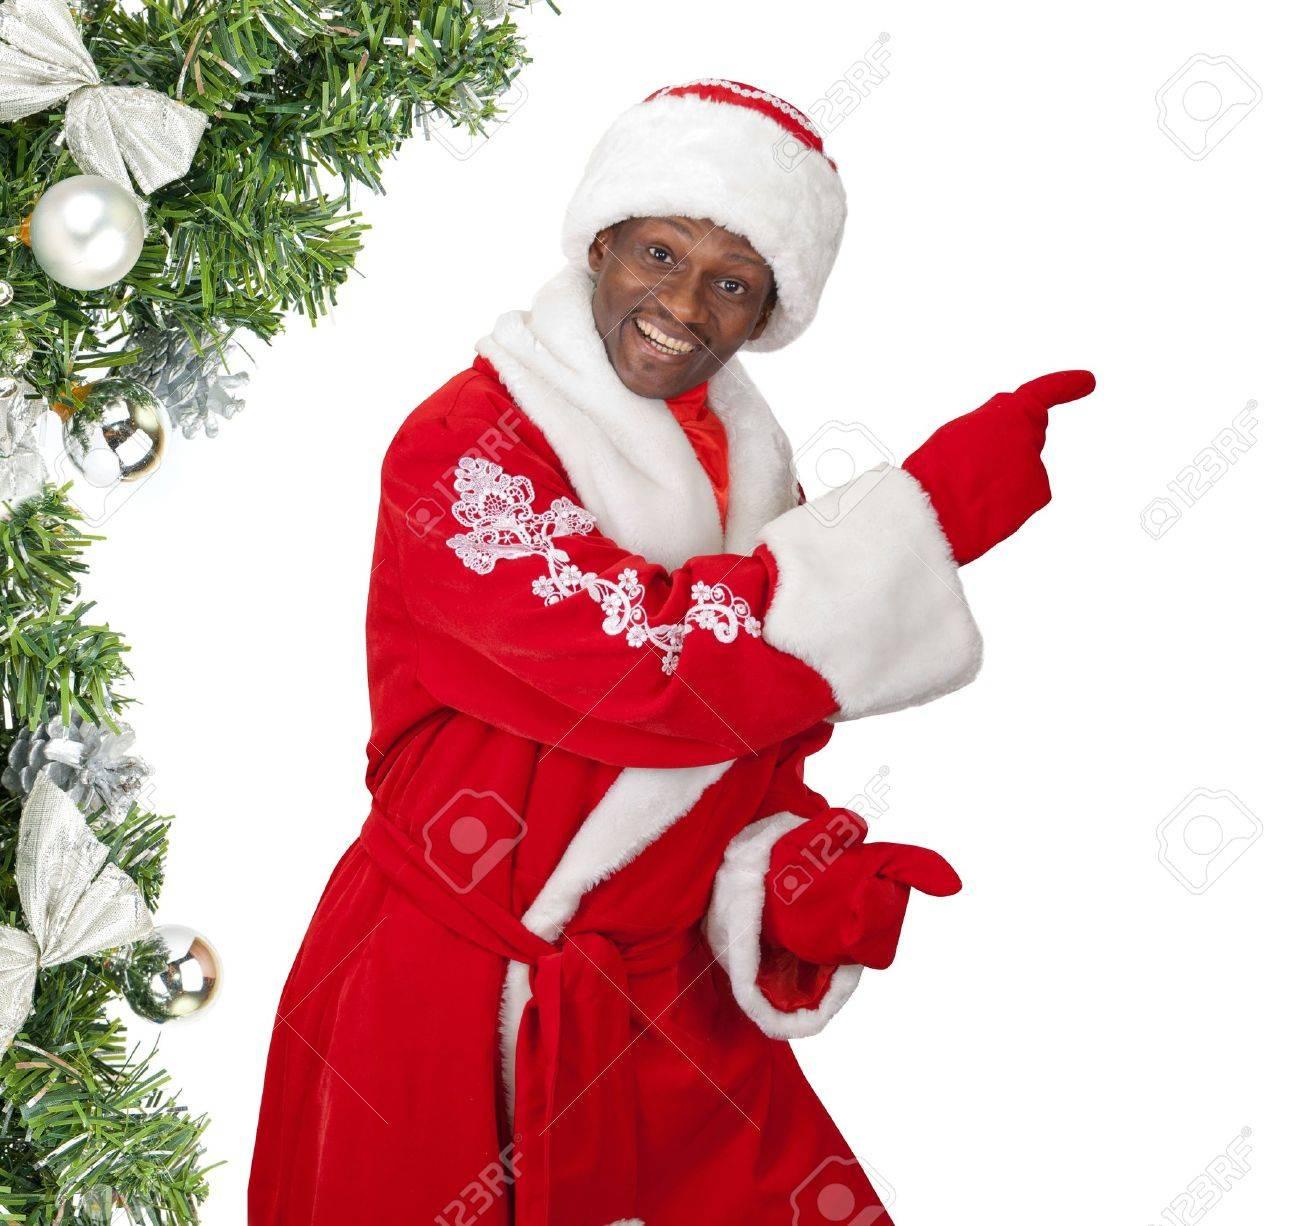 Pere Noel Noir Surprised Black Santa Claus On A White Background Stock Photo